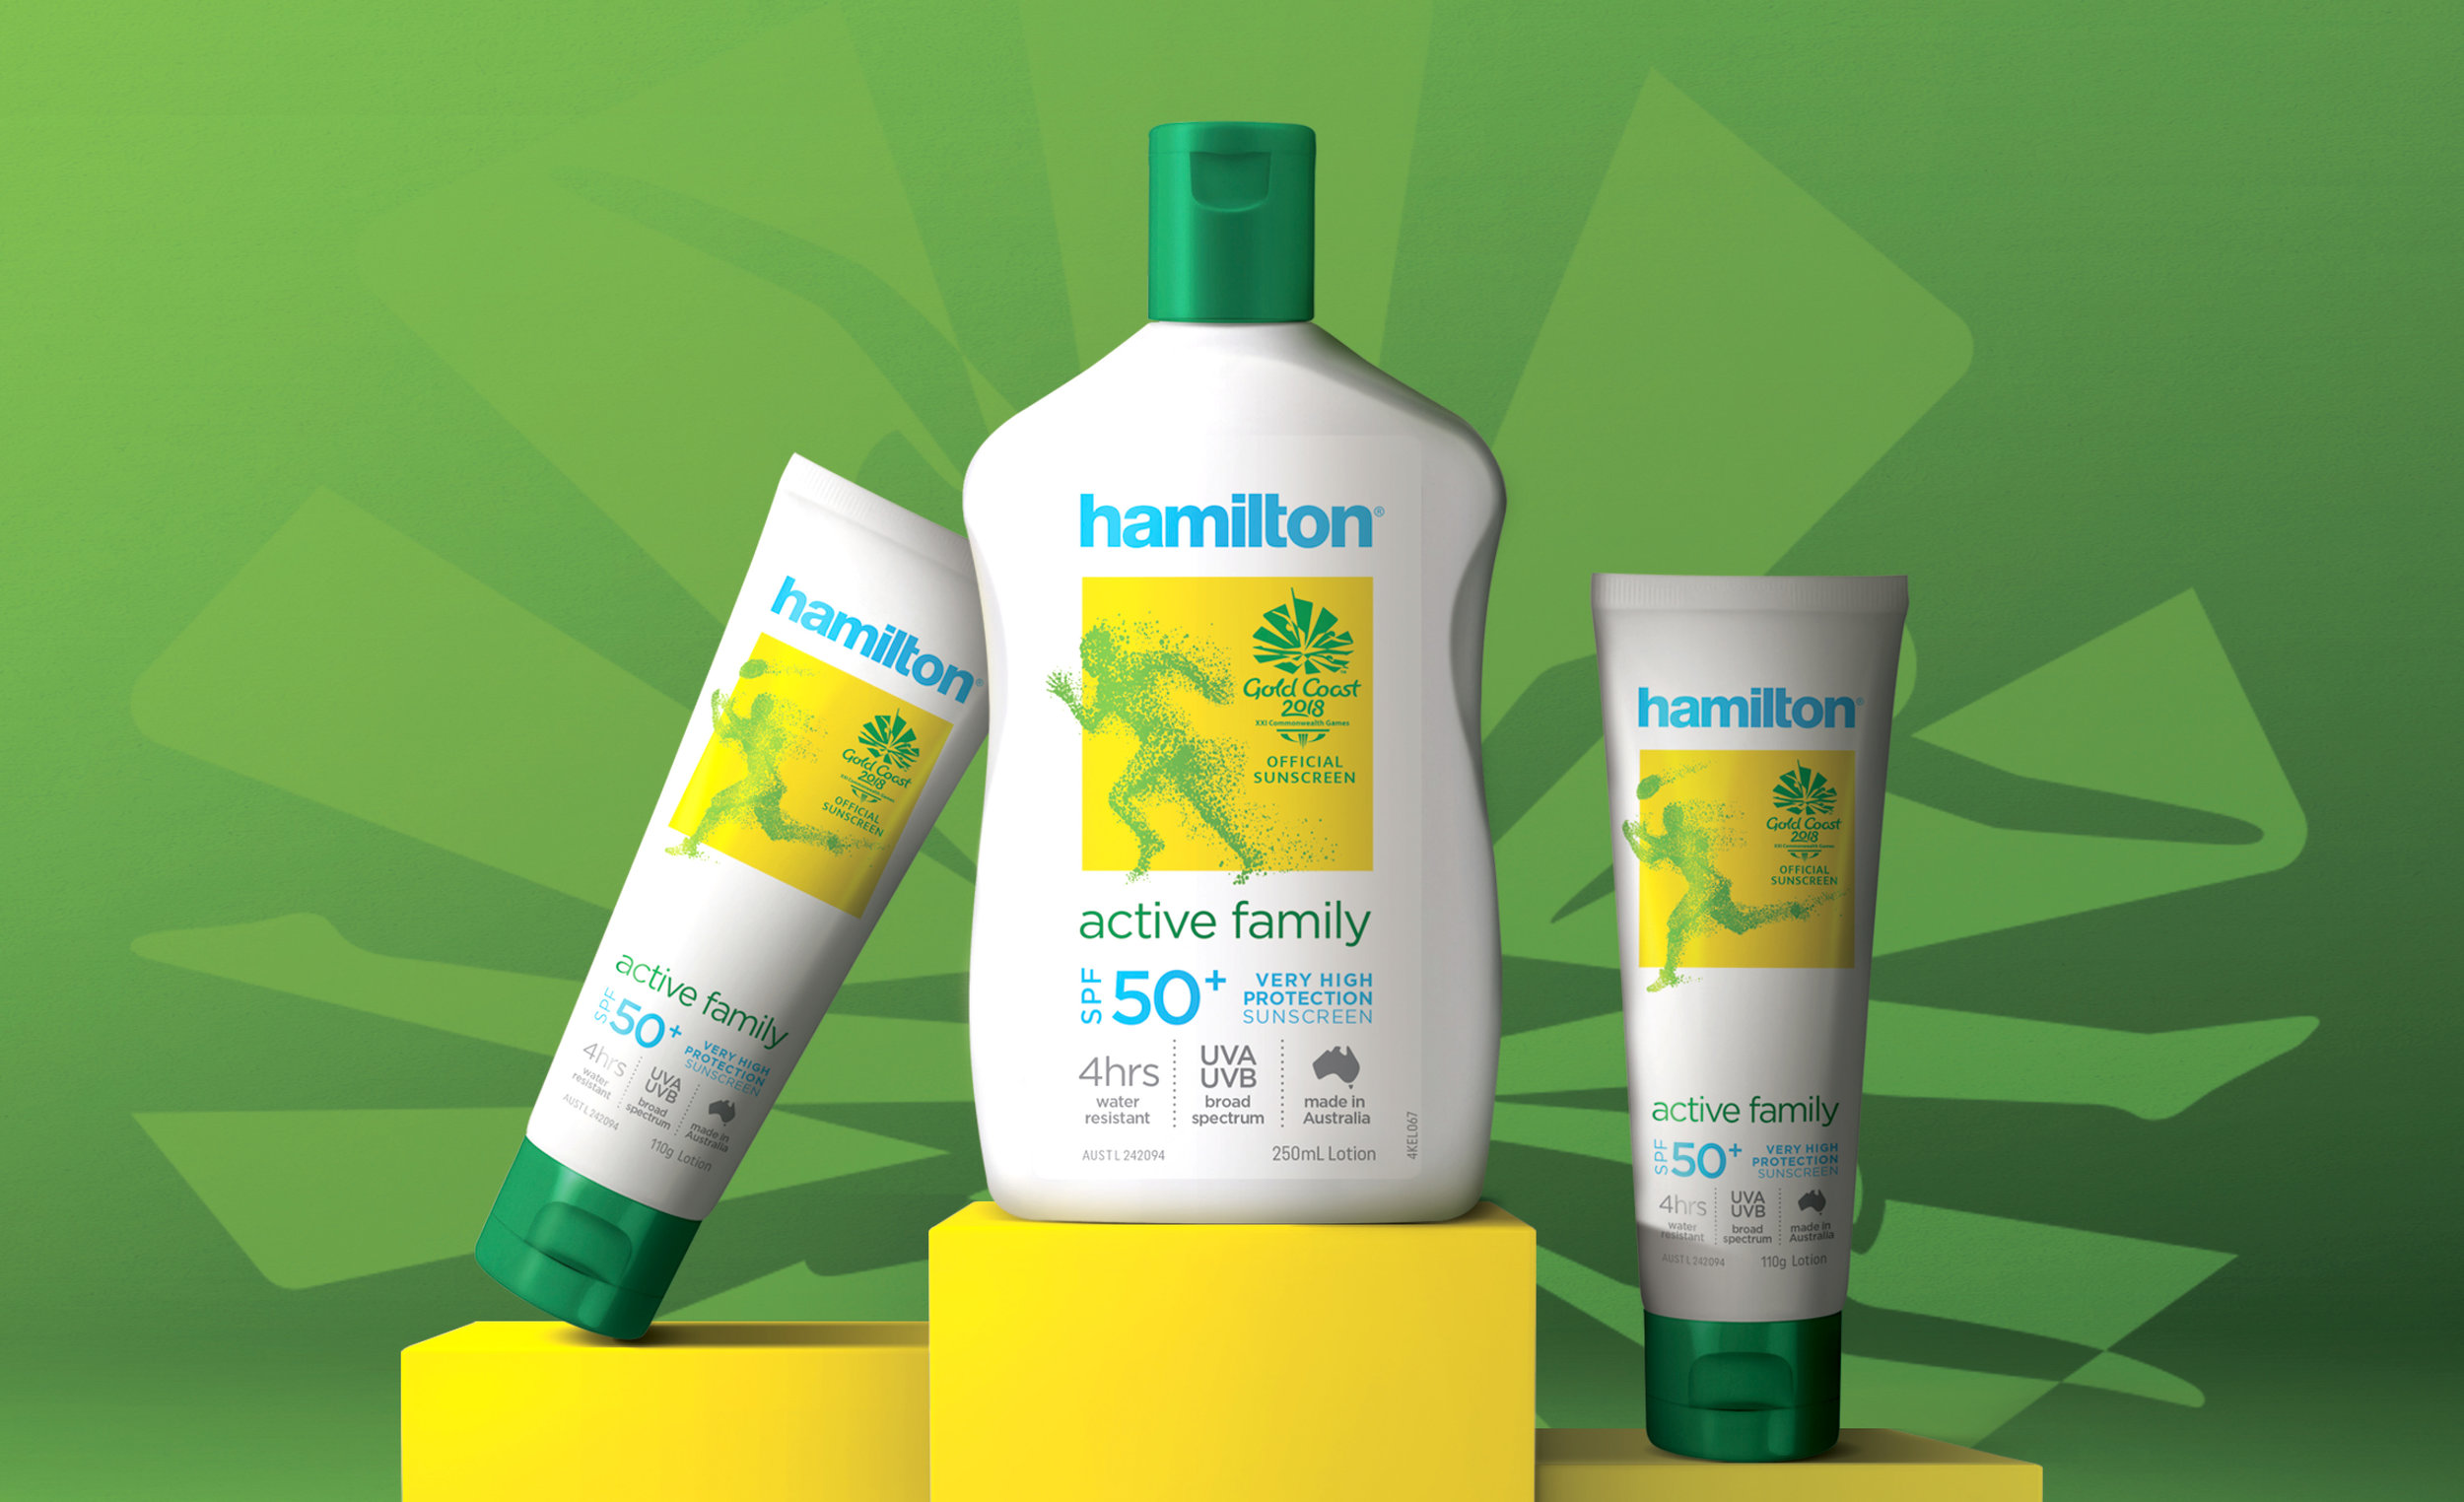 Hamilton Sun Care Packaging Design Our Revolution Brand Design Brand Logo Brand Strategy Brand Innovation Beauty Packaging Beauty Design Beauty Brand Personal Care Branding Personal Care Packaging Personal Care innovation Packaging Innovation